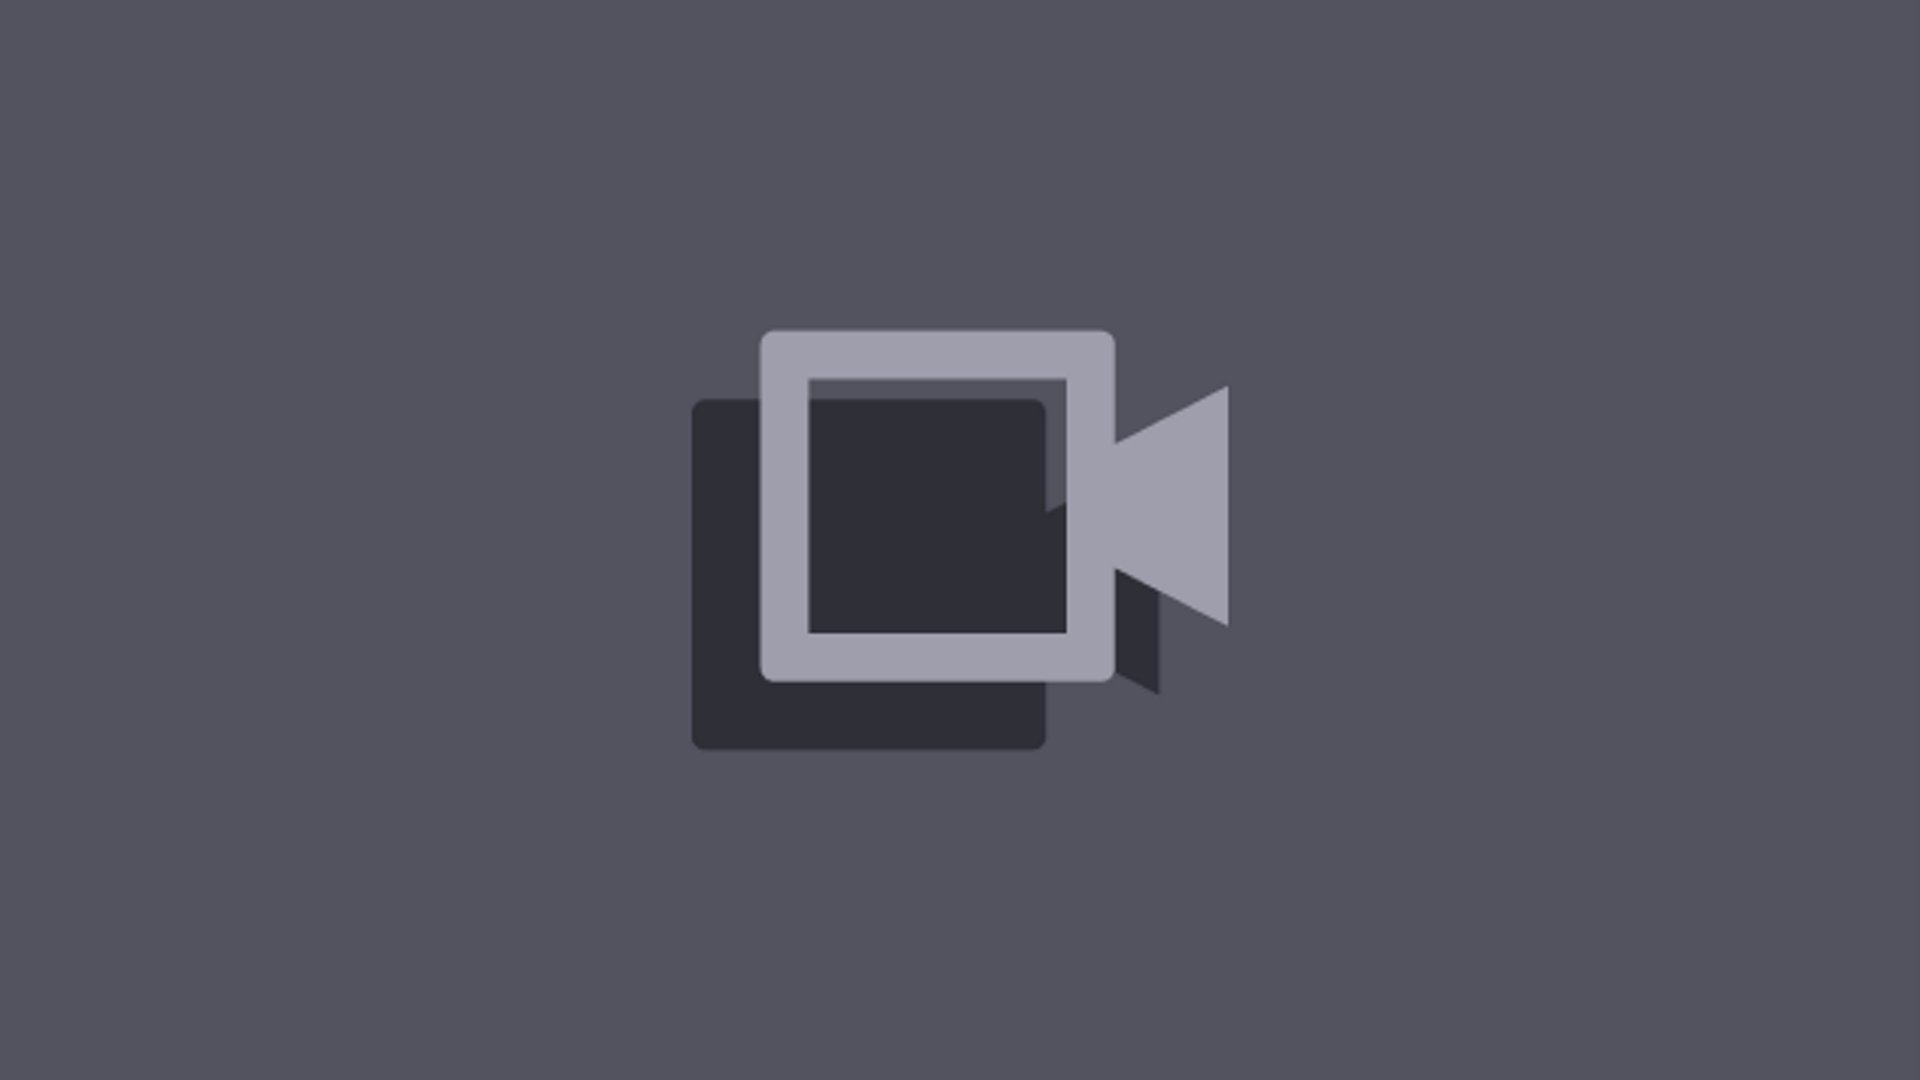 Twitch stream of MrSavage